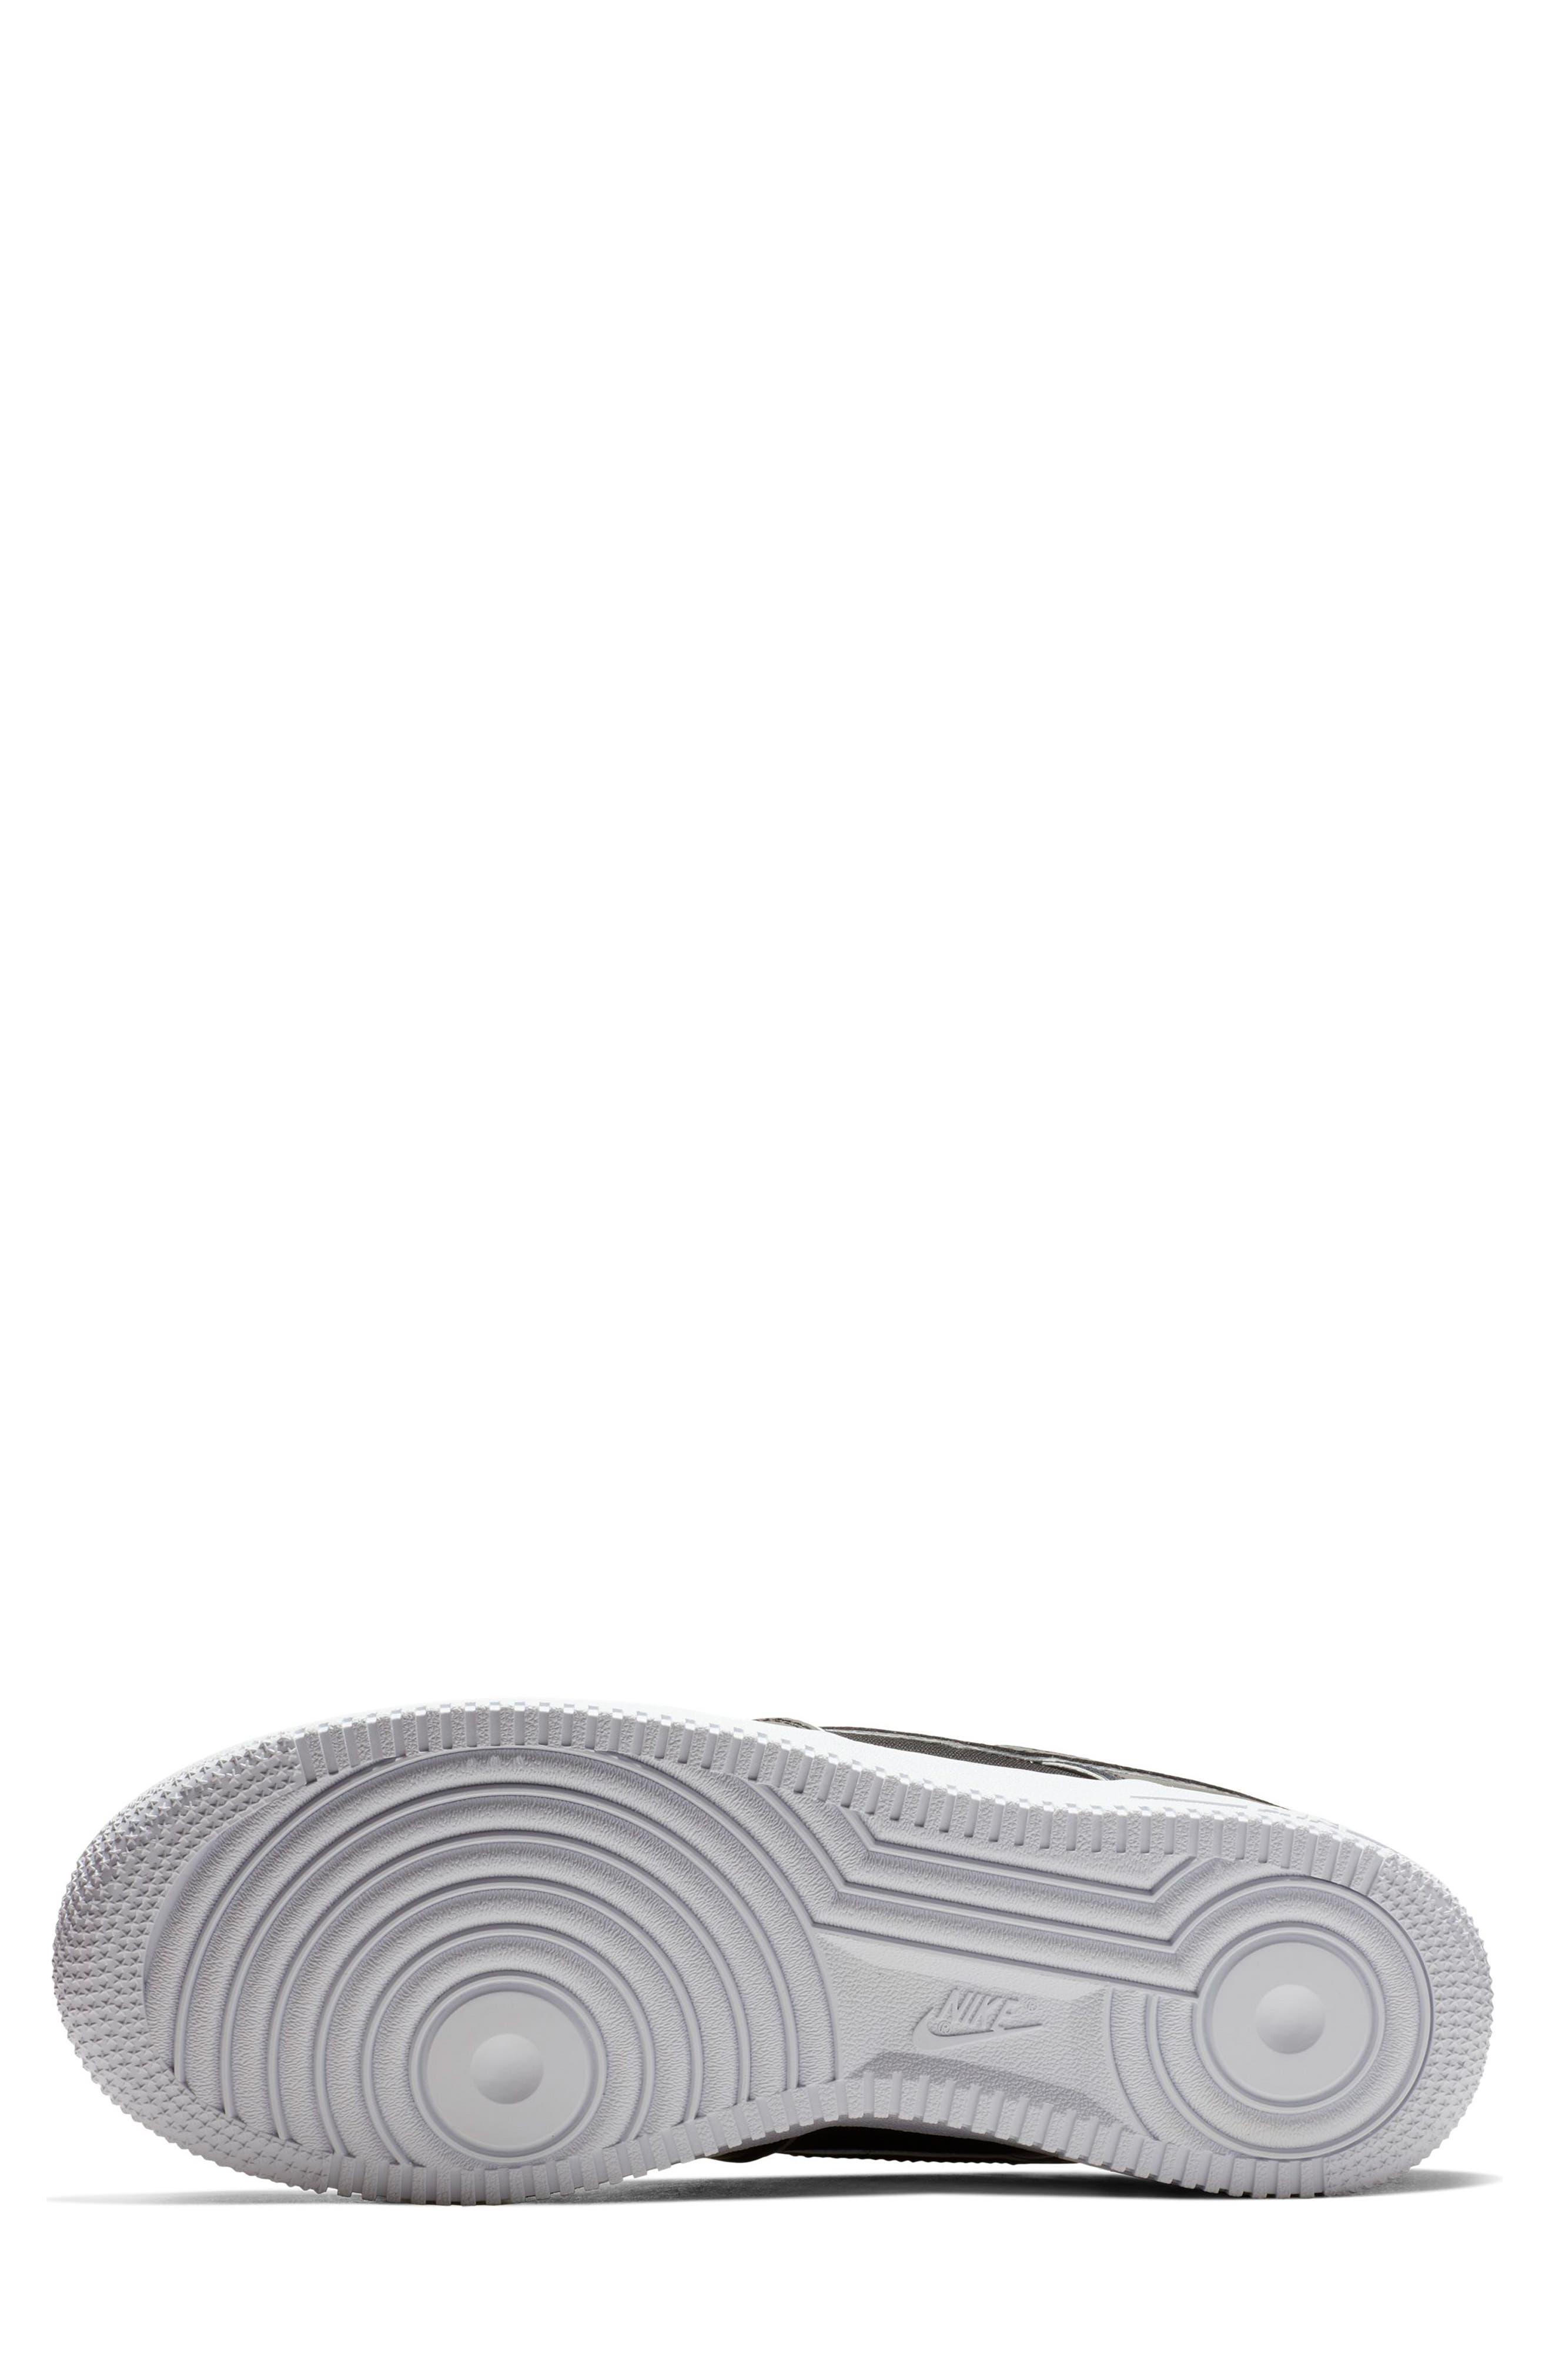 NIKE, Air Force 1 '07 LV8 4 Sneaker, Alternate thumbnail 4, color, 001